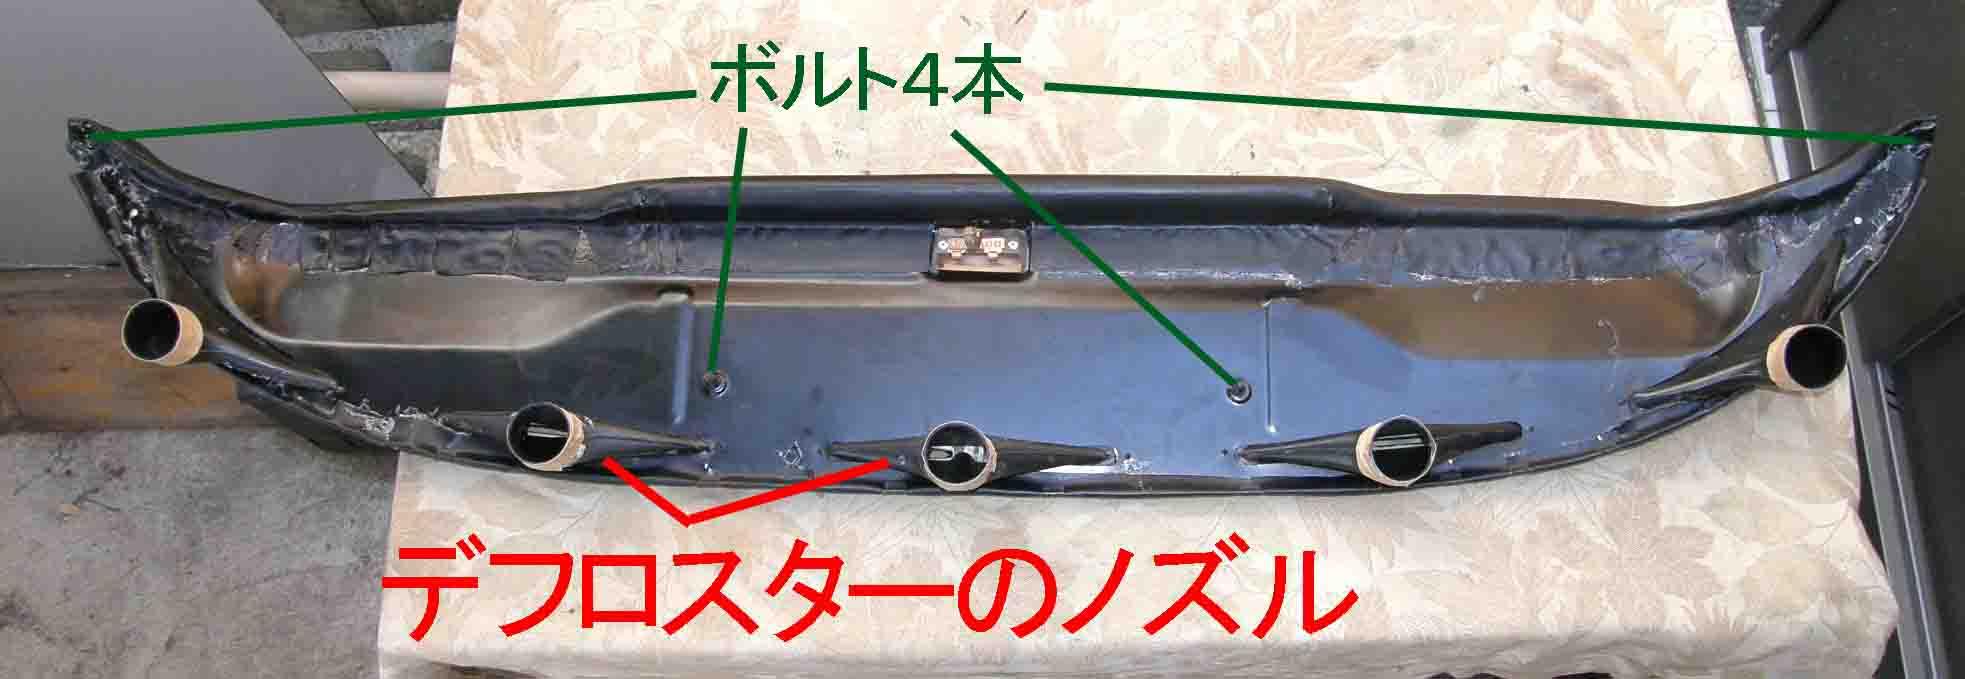 blogP3220370のコピー.jpg